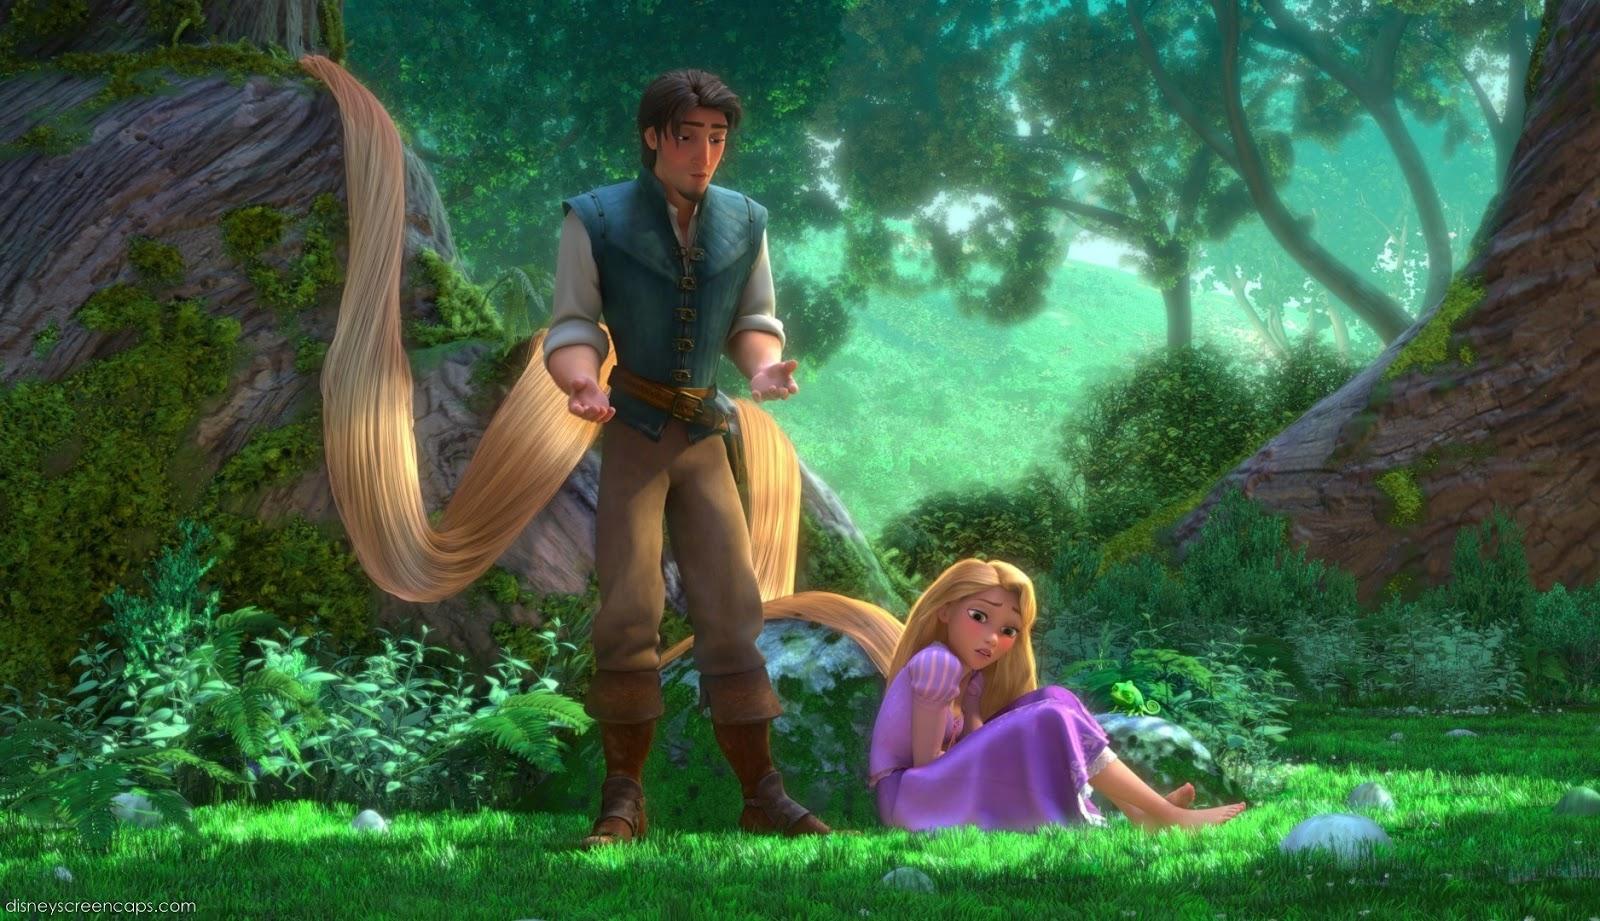 Animated Barbie Wallpaper Disney Tangled Rapunzel And Eugene Wallpapers Kids